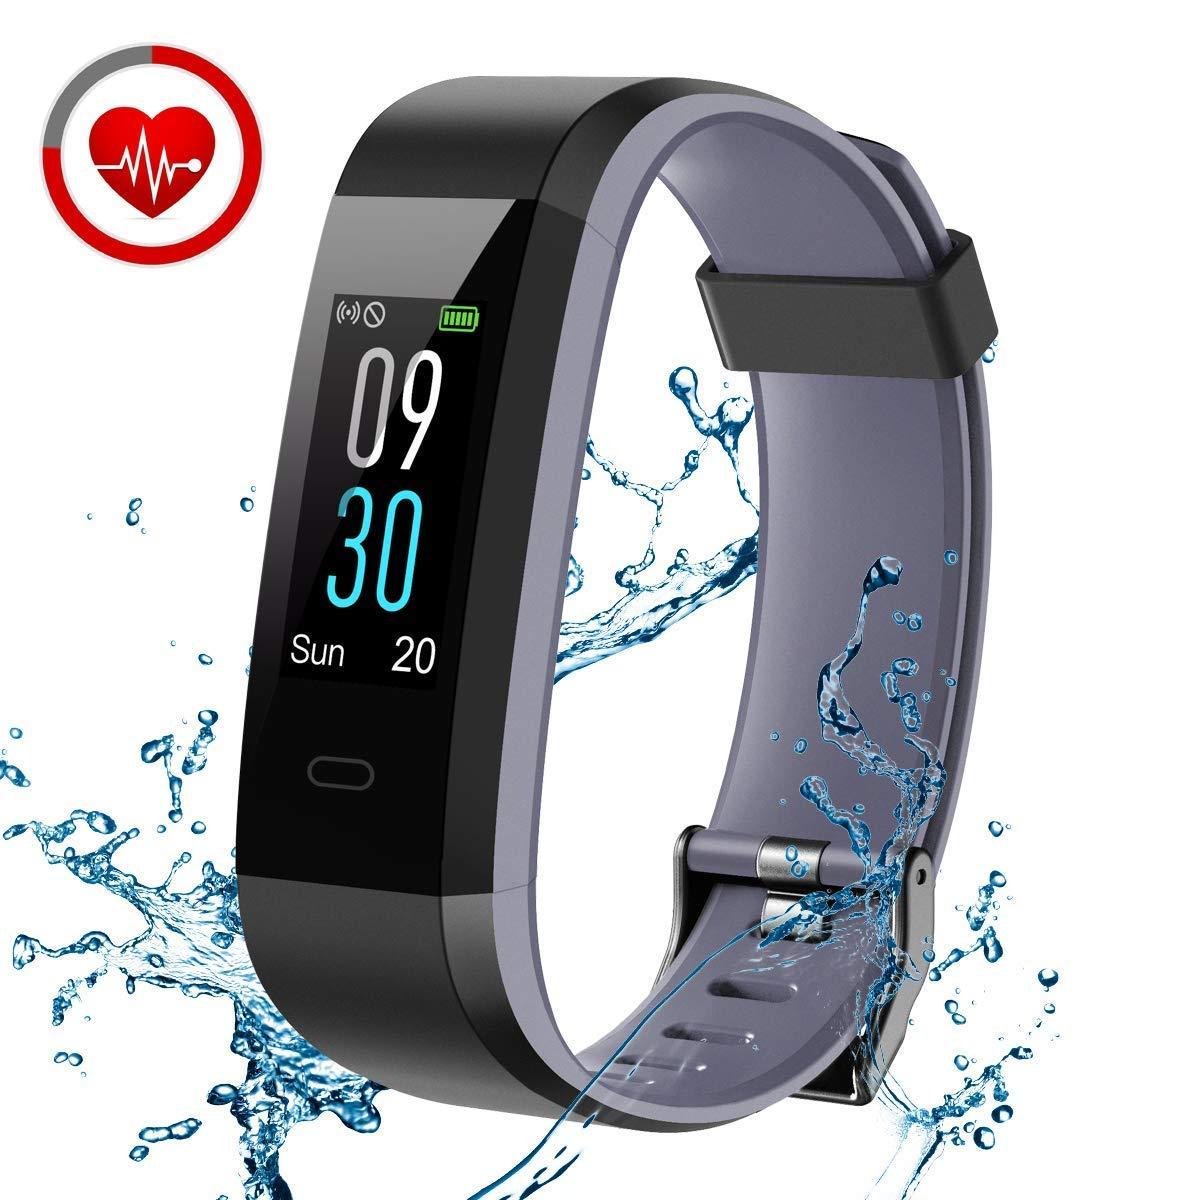 CHEREEKI Fitness Tracker with Heart Rate Monitor, IP68 Waterproof Activity Tracker